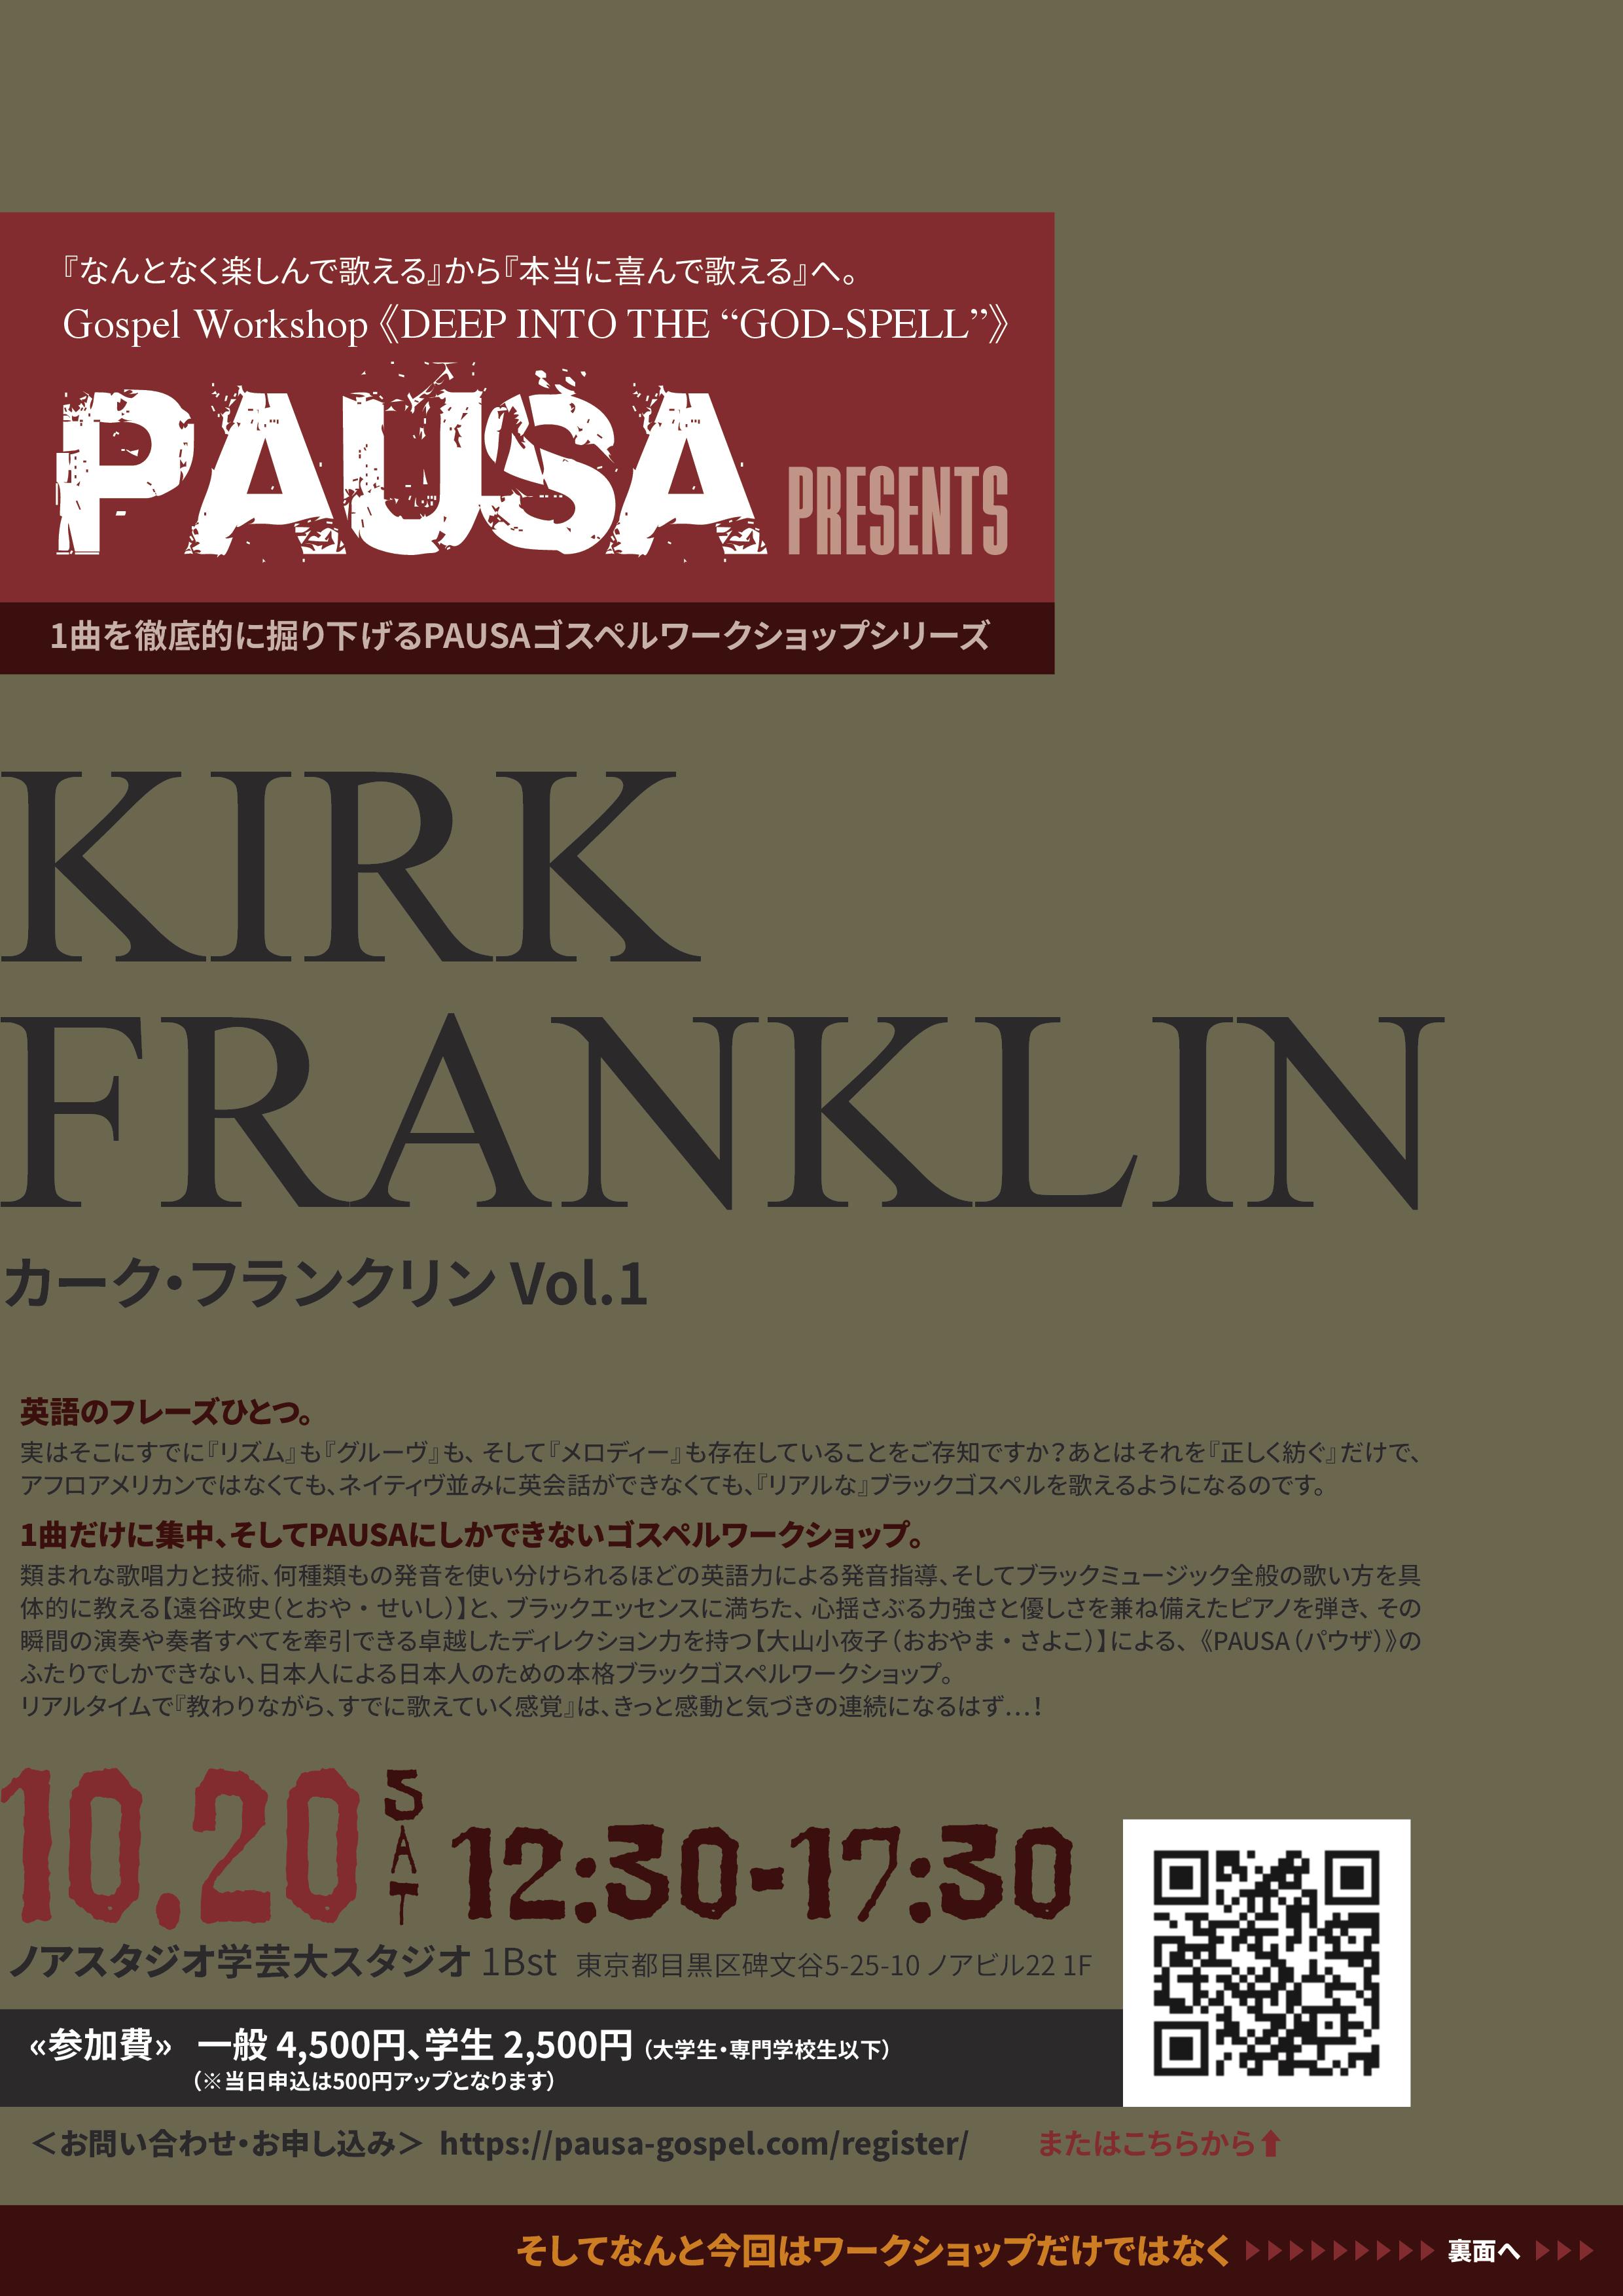 [2018.10.20 SAT] PAUSAゴスペルワークショップシリーズ「Kirk Franklin vol.1」in 東京